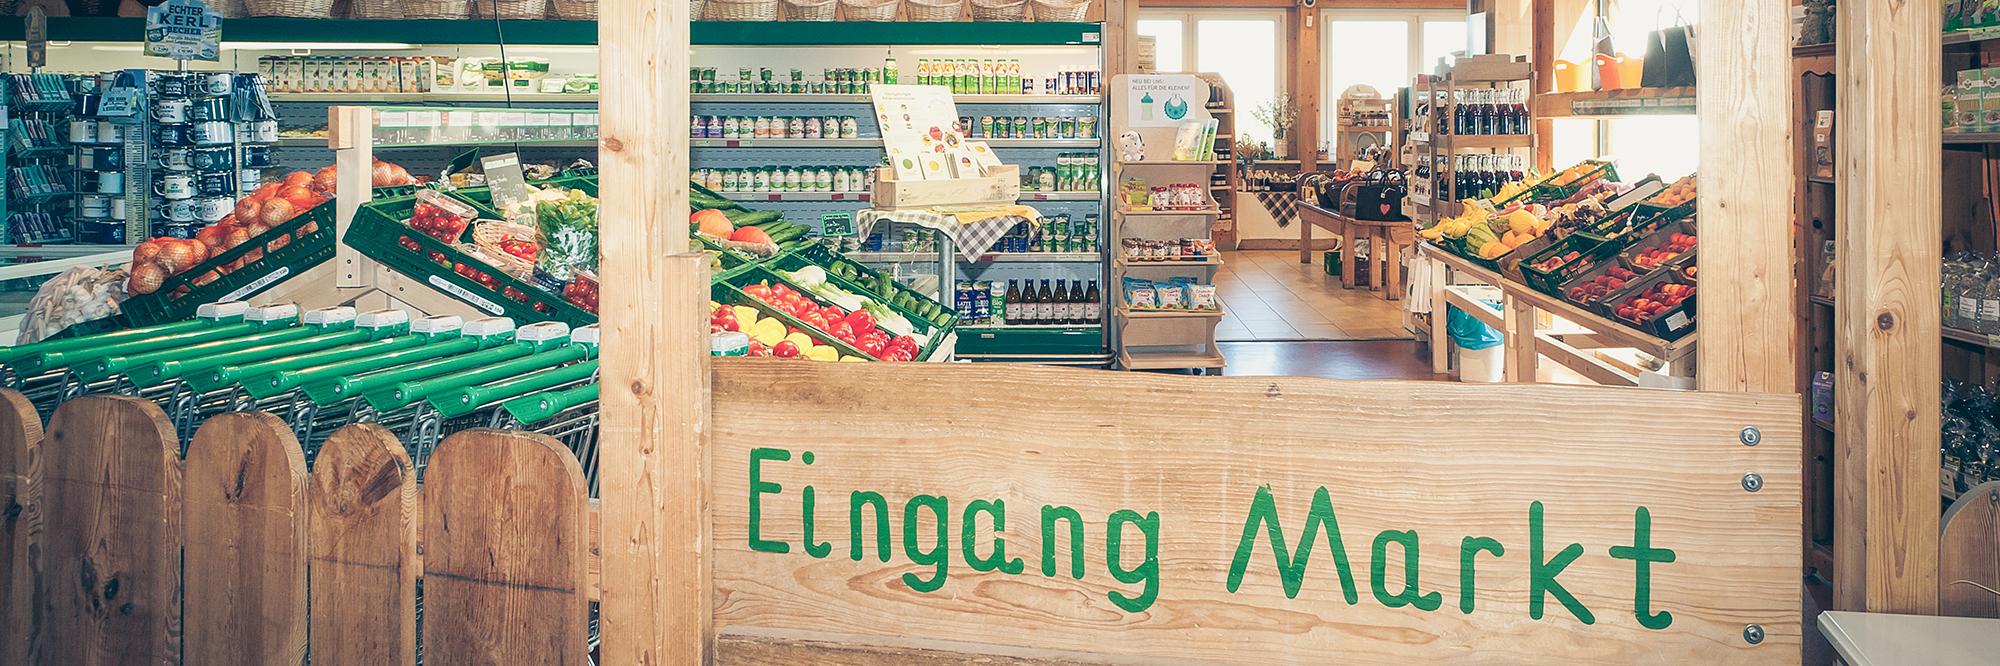 Bauernmarkt Dasing Handel